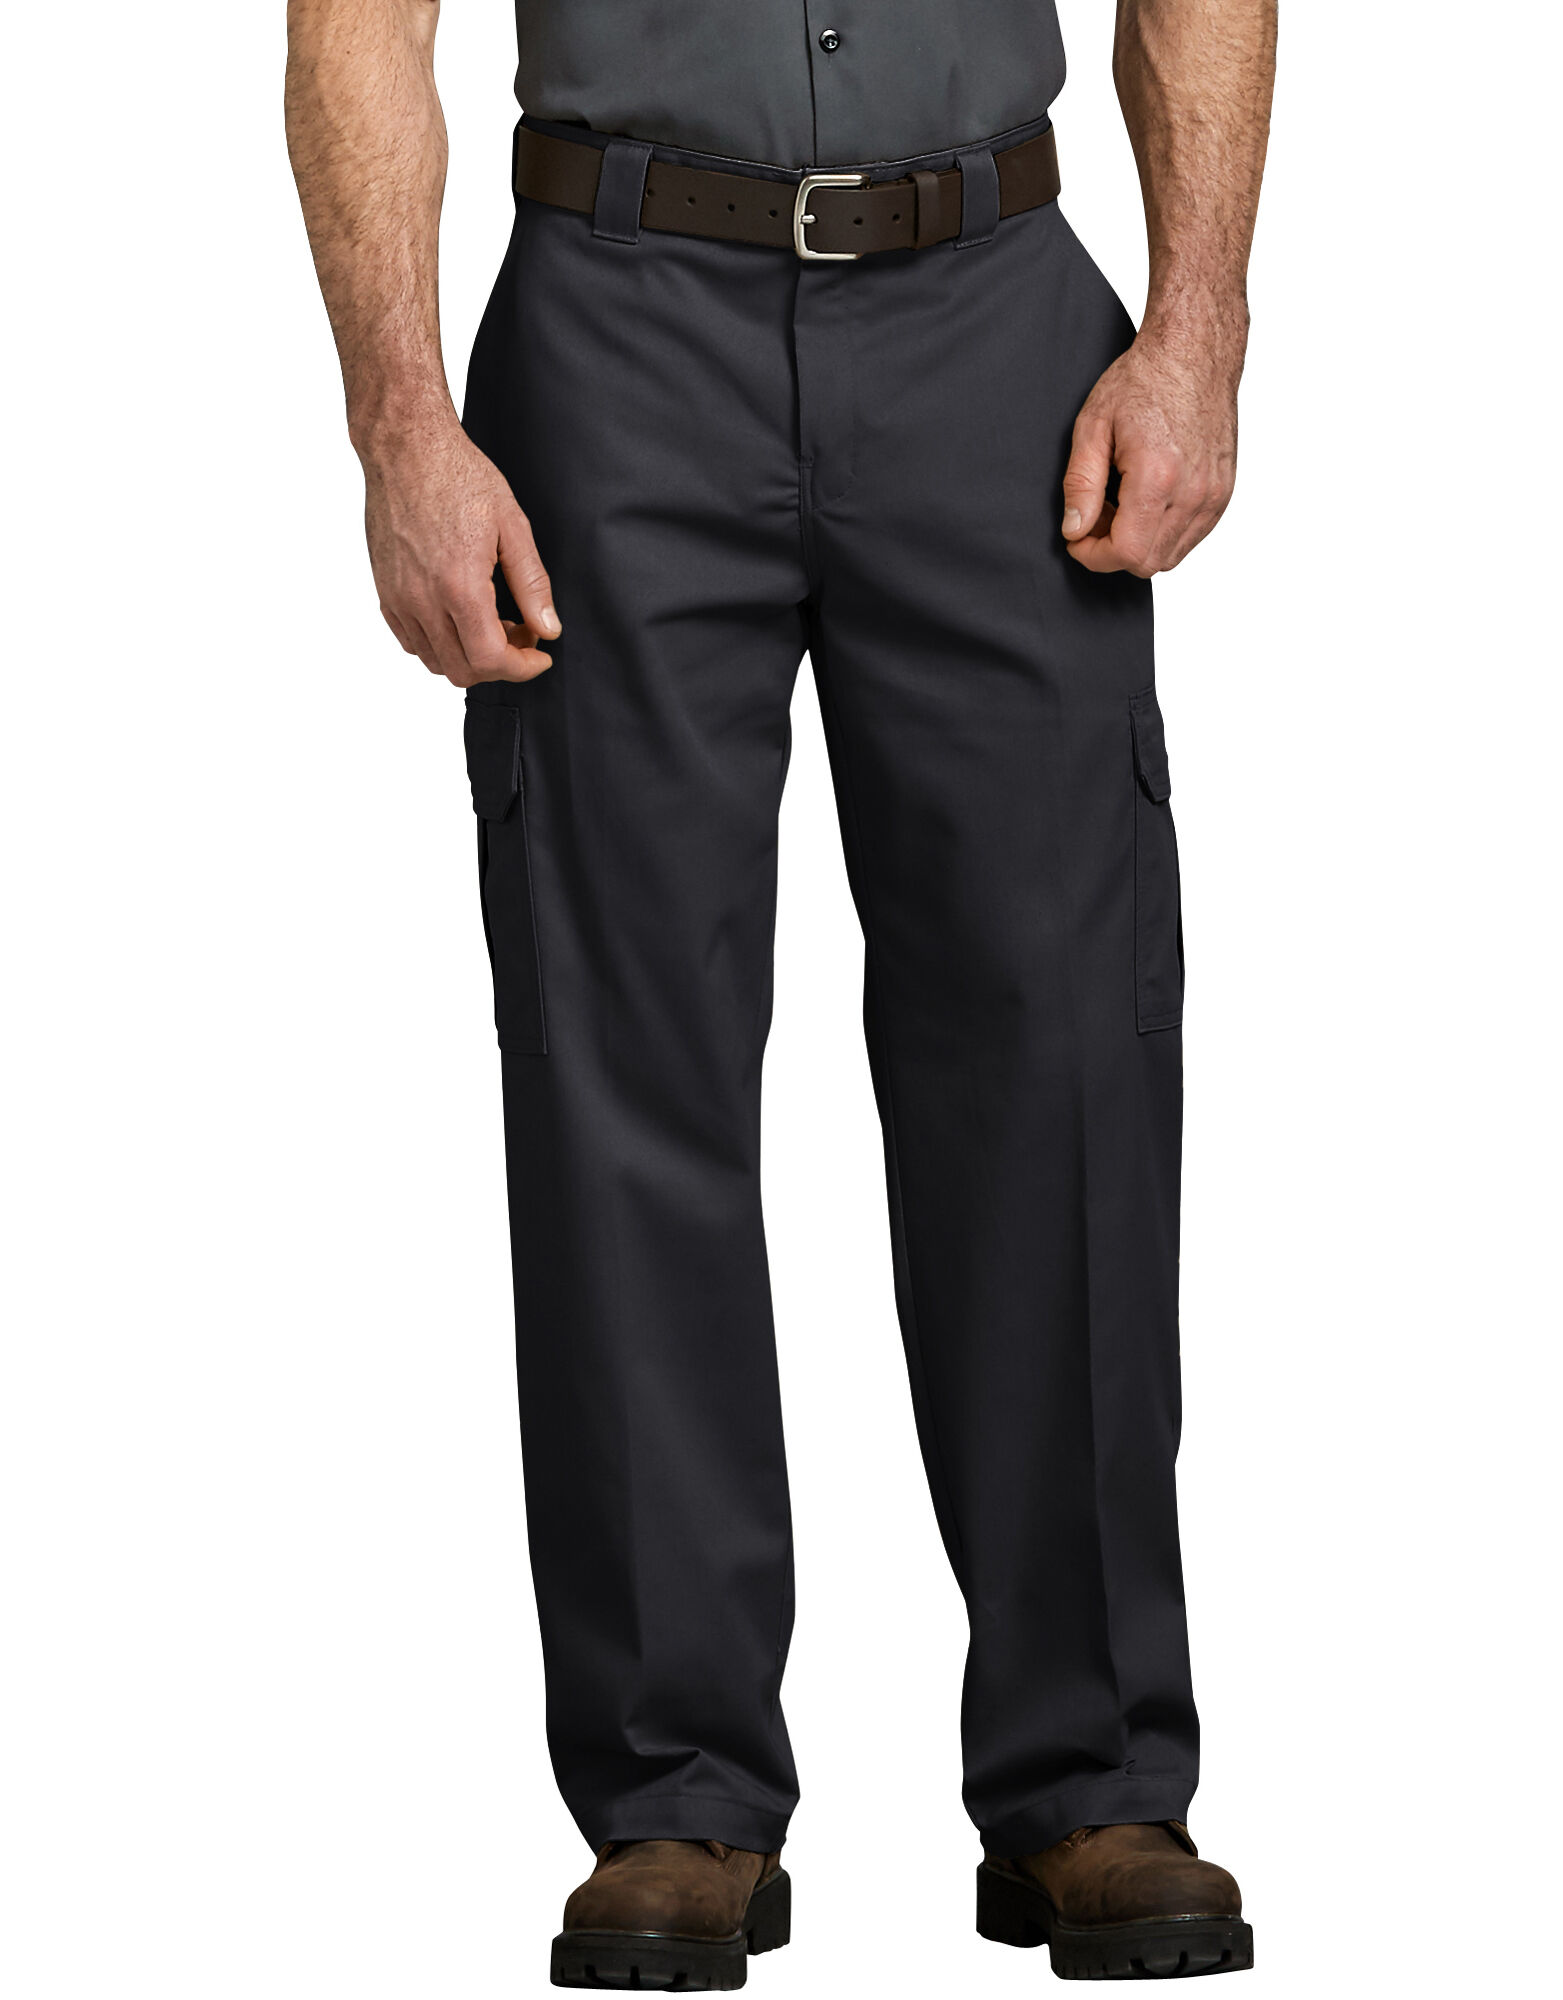 Men&39s Cargo Pants | Dickies